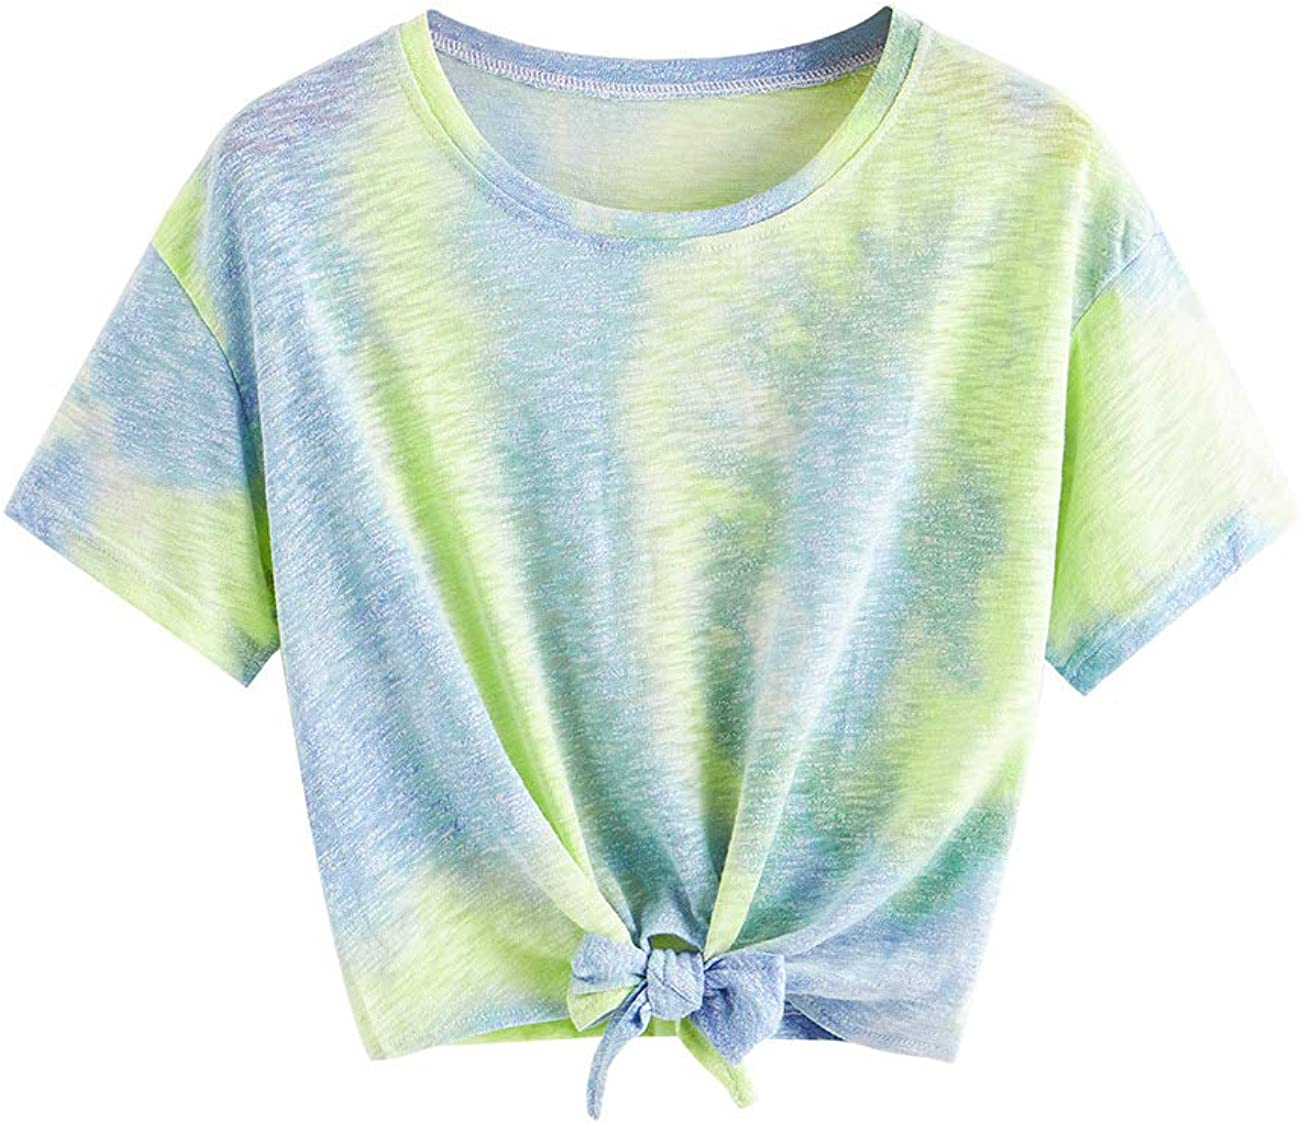 Romwe Women's Short Sleeve Tie Front Knot Casual Crop Top Tee T-Shirt